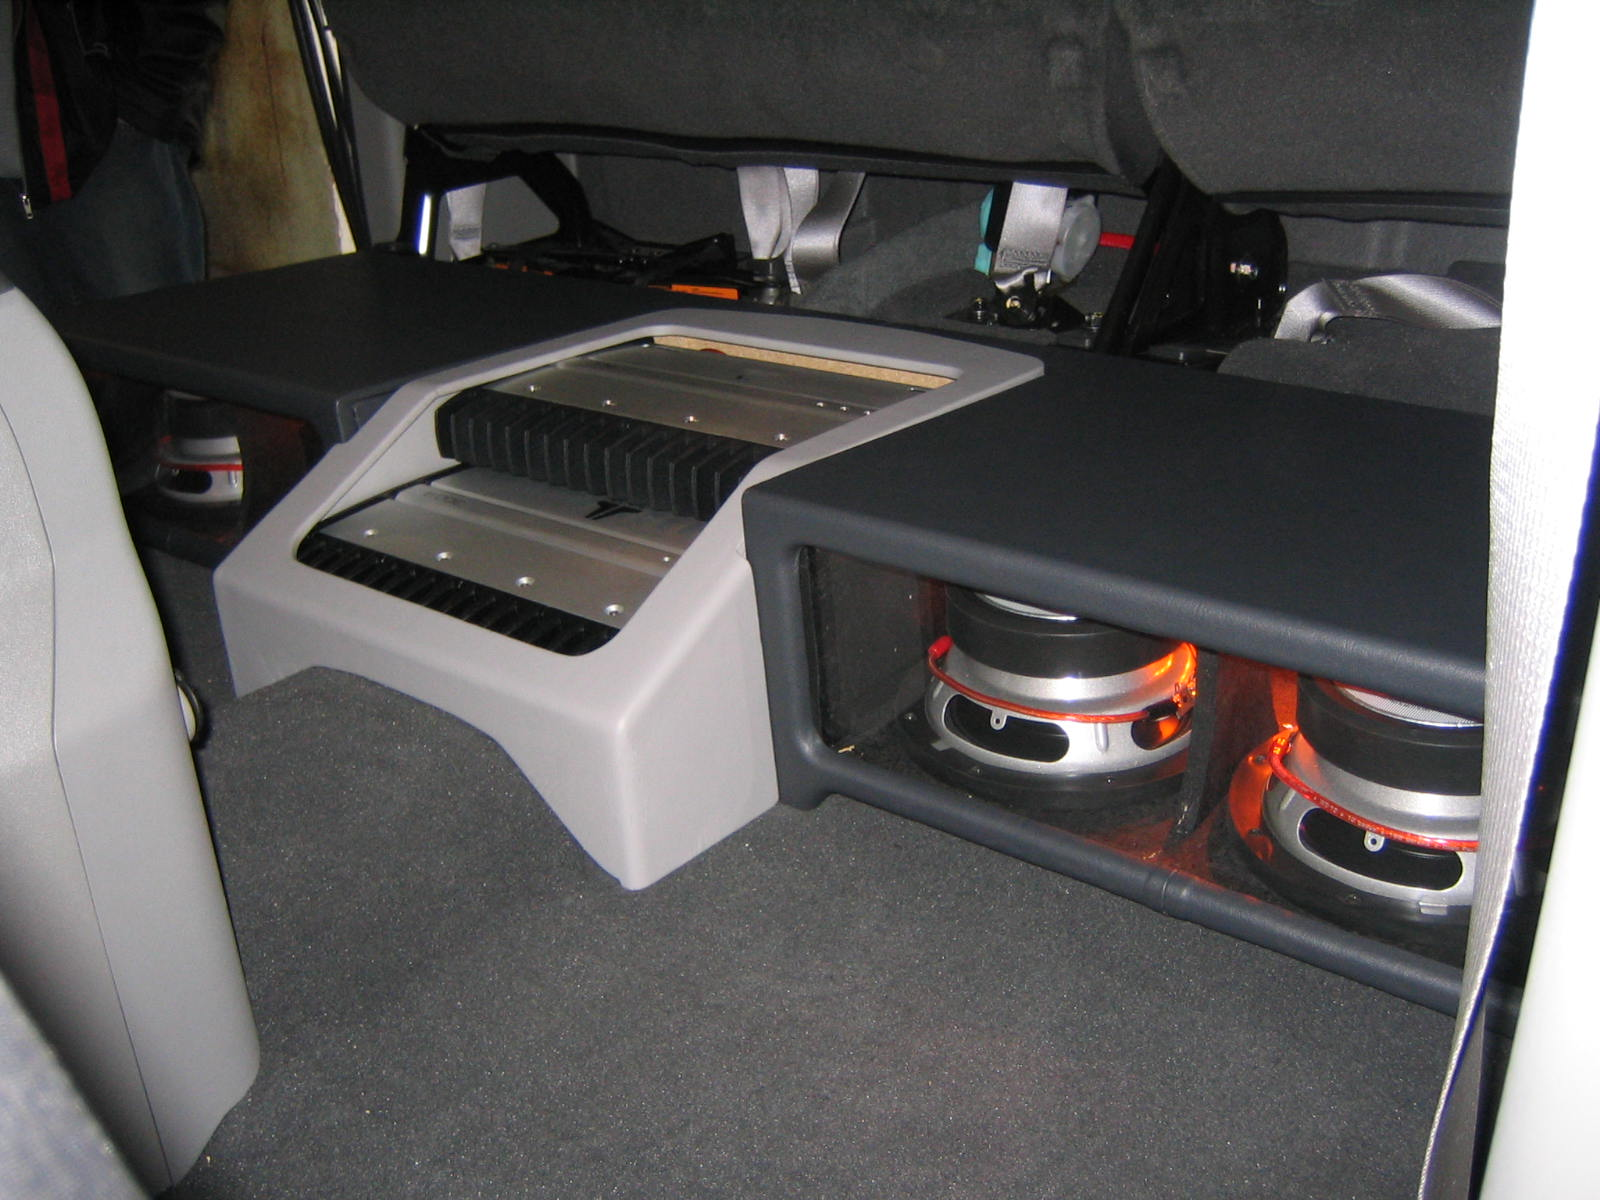 Jl audio stealth box tor titan crew cab nissan titan forum jl audio stealth box tor titan crew cab vanachro Gallery